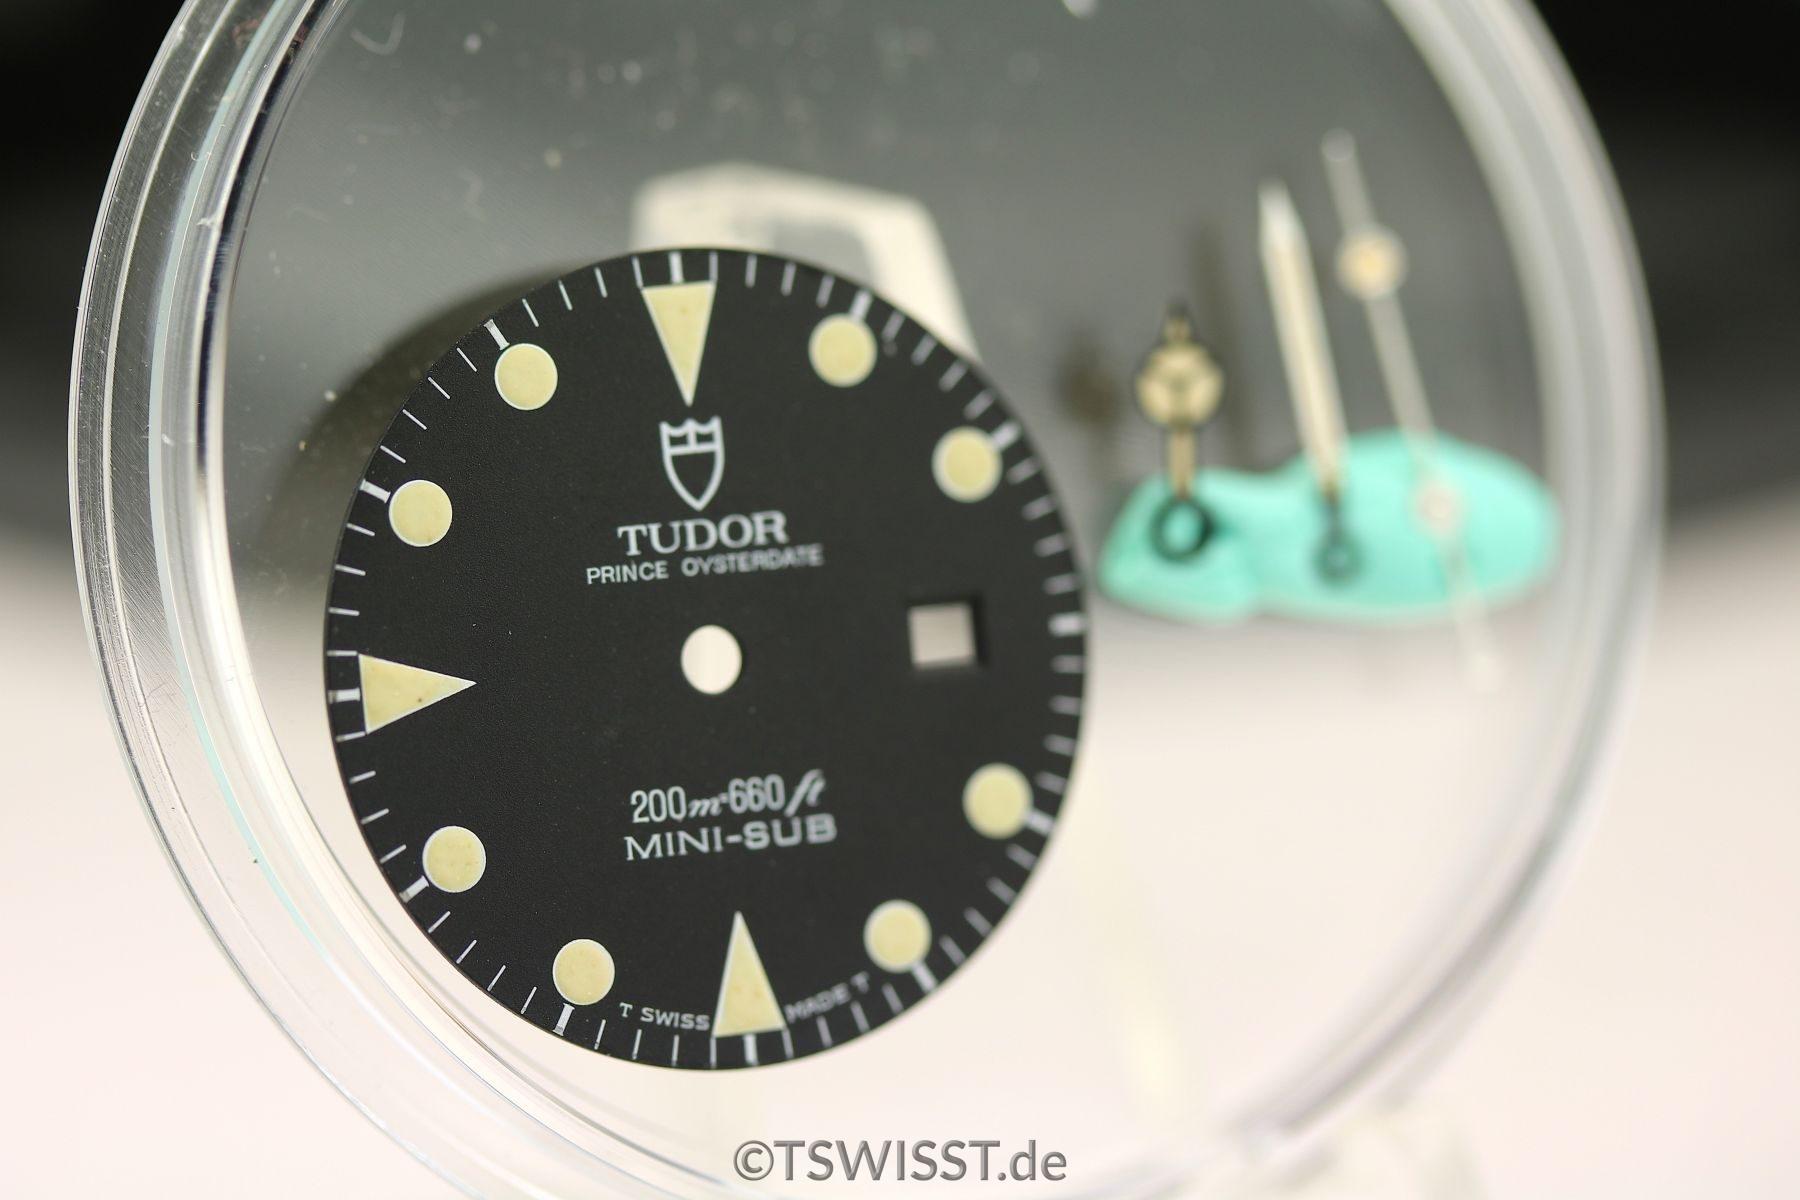 Tudor Mini-Sub dial&hands